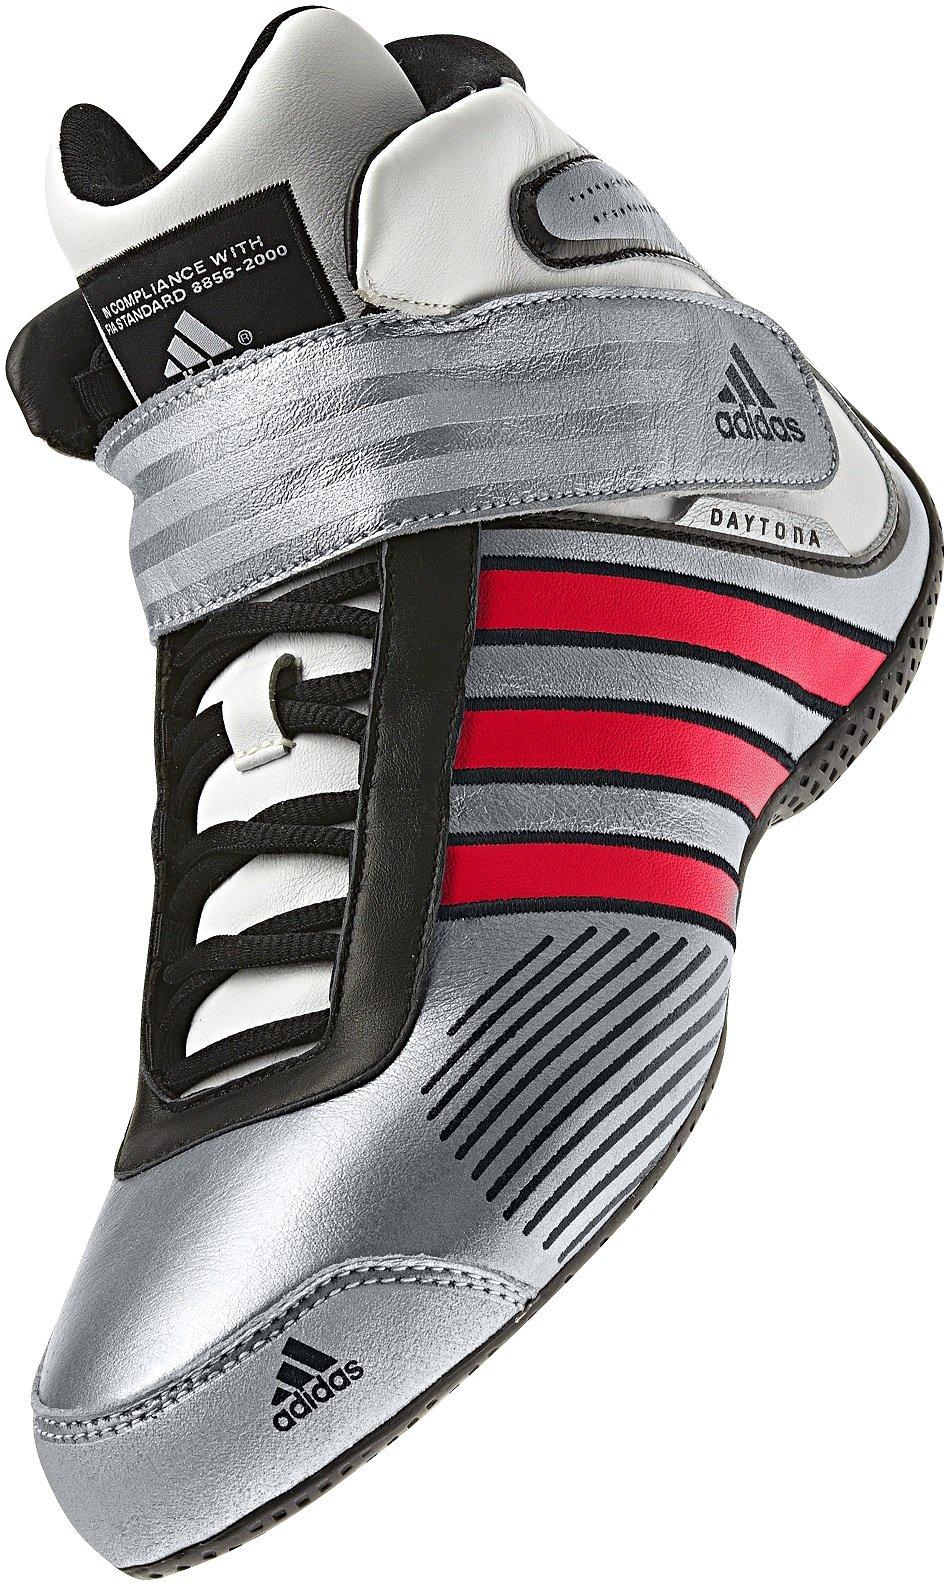 fractura Tigre radical  adidas Daytona Race Boots (10.5, silver/red): Amazon.co.uk: Car & Motorbike